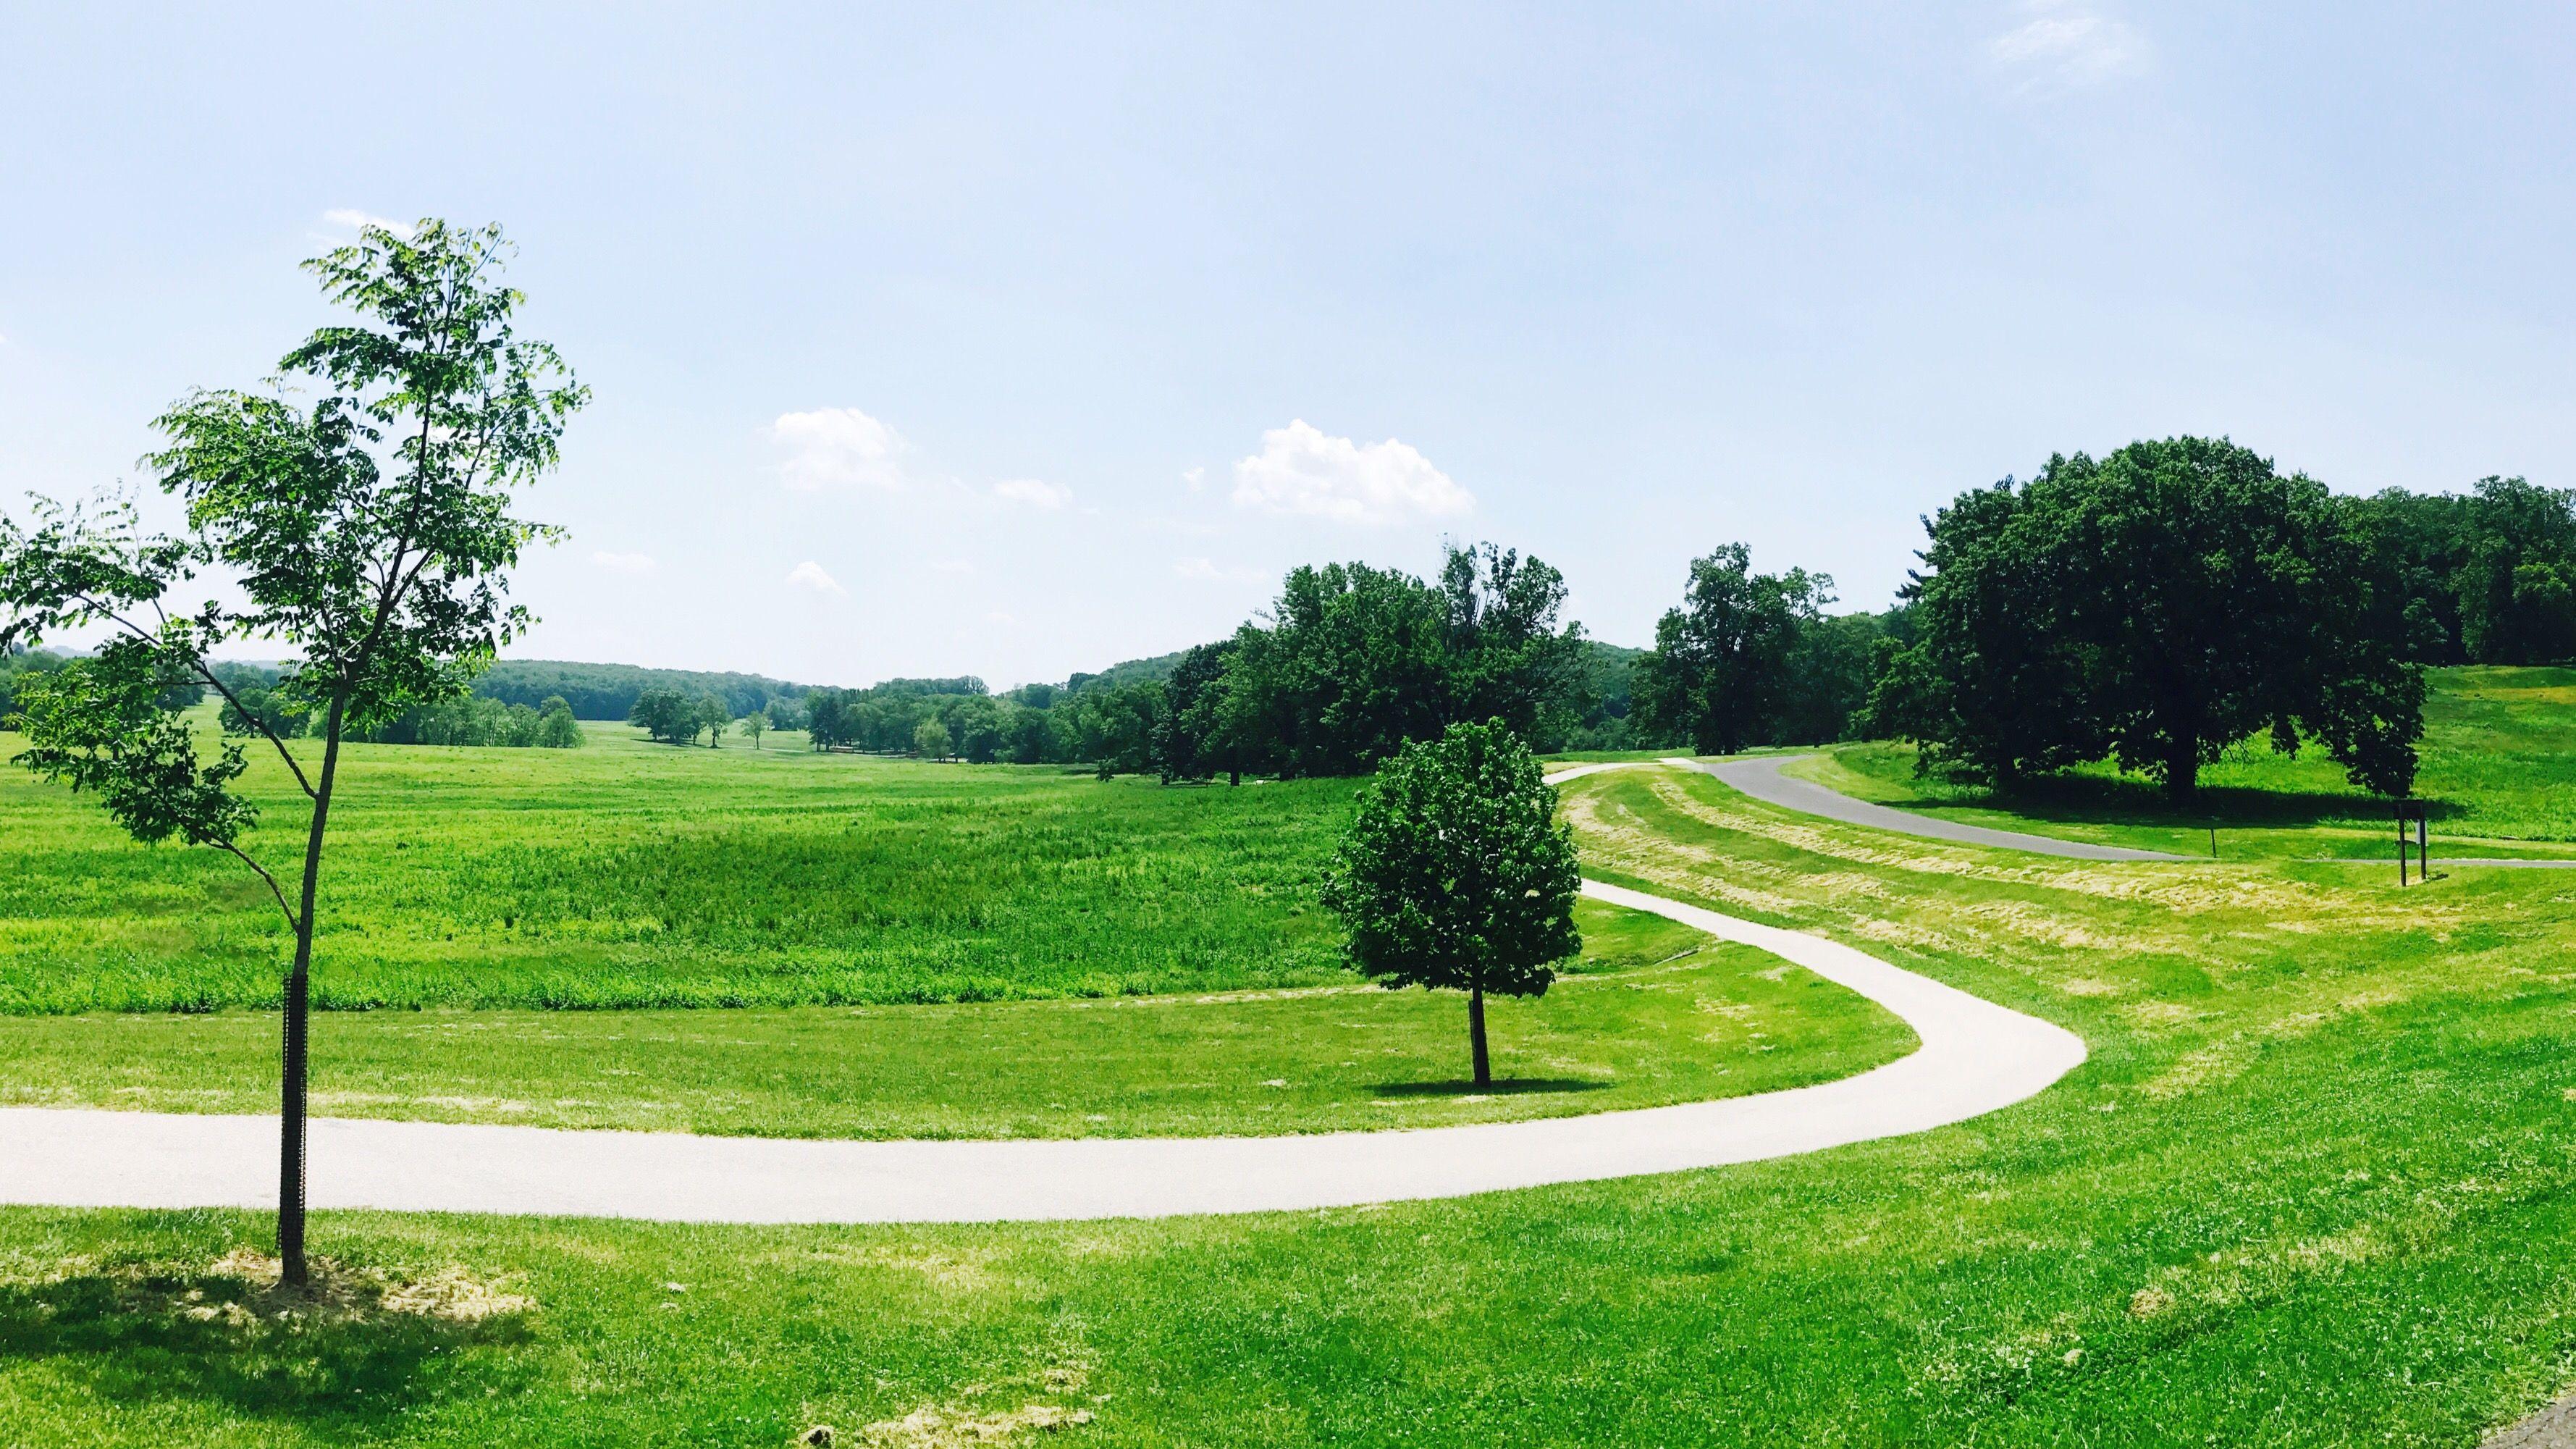 Golf Courses Along the Louisiana Audubon Golf Trail